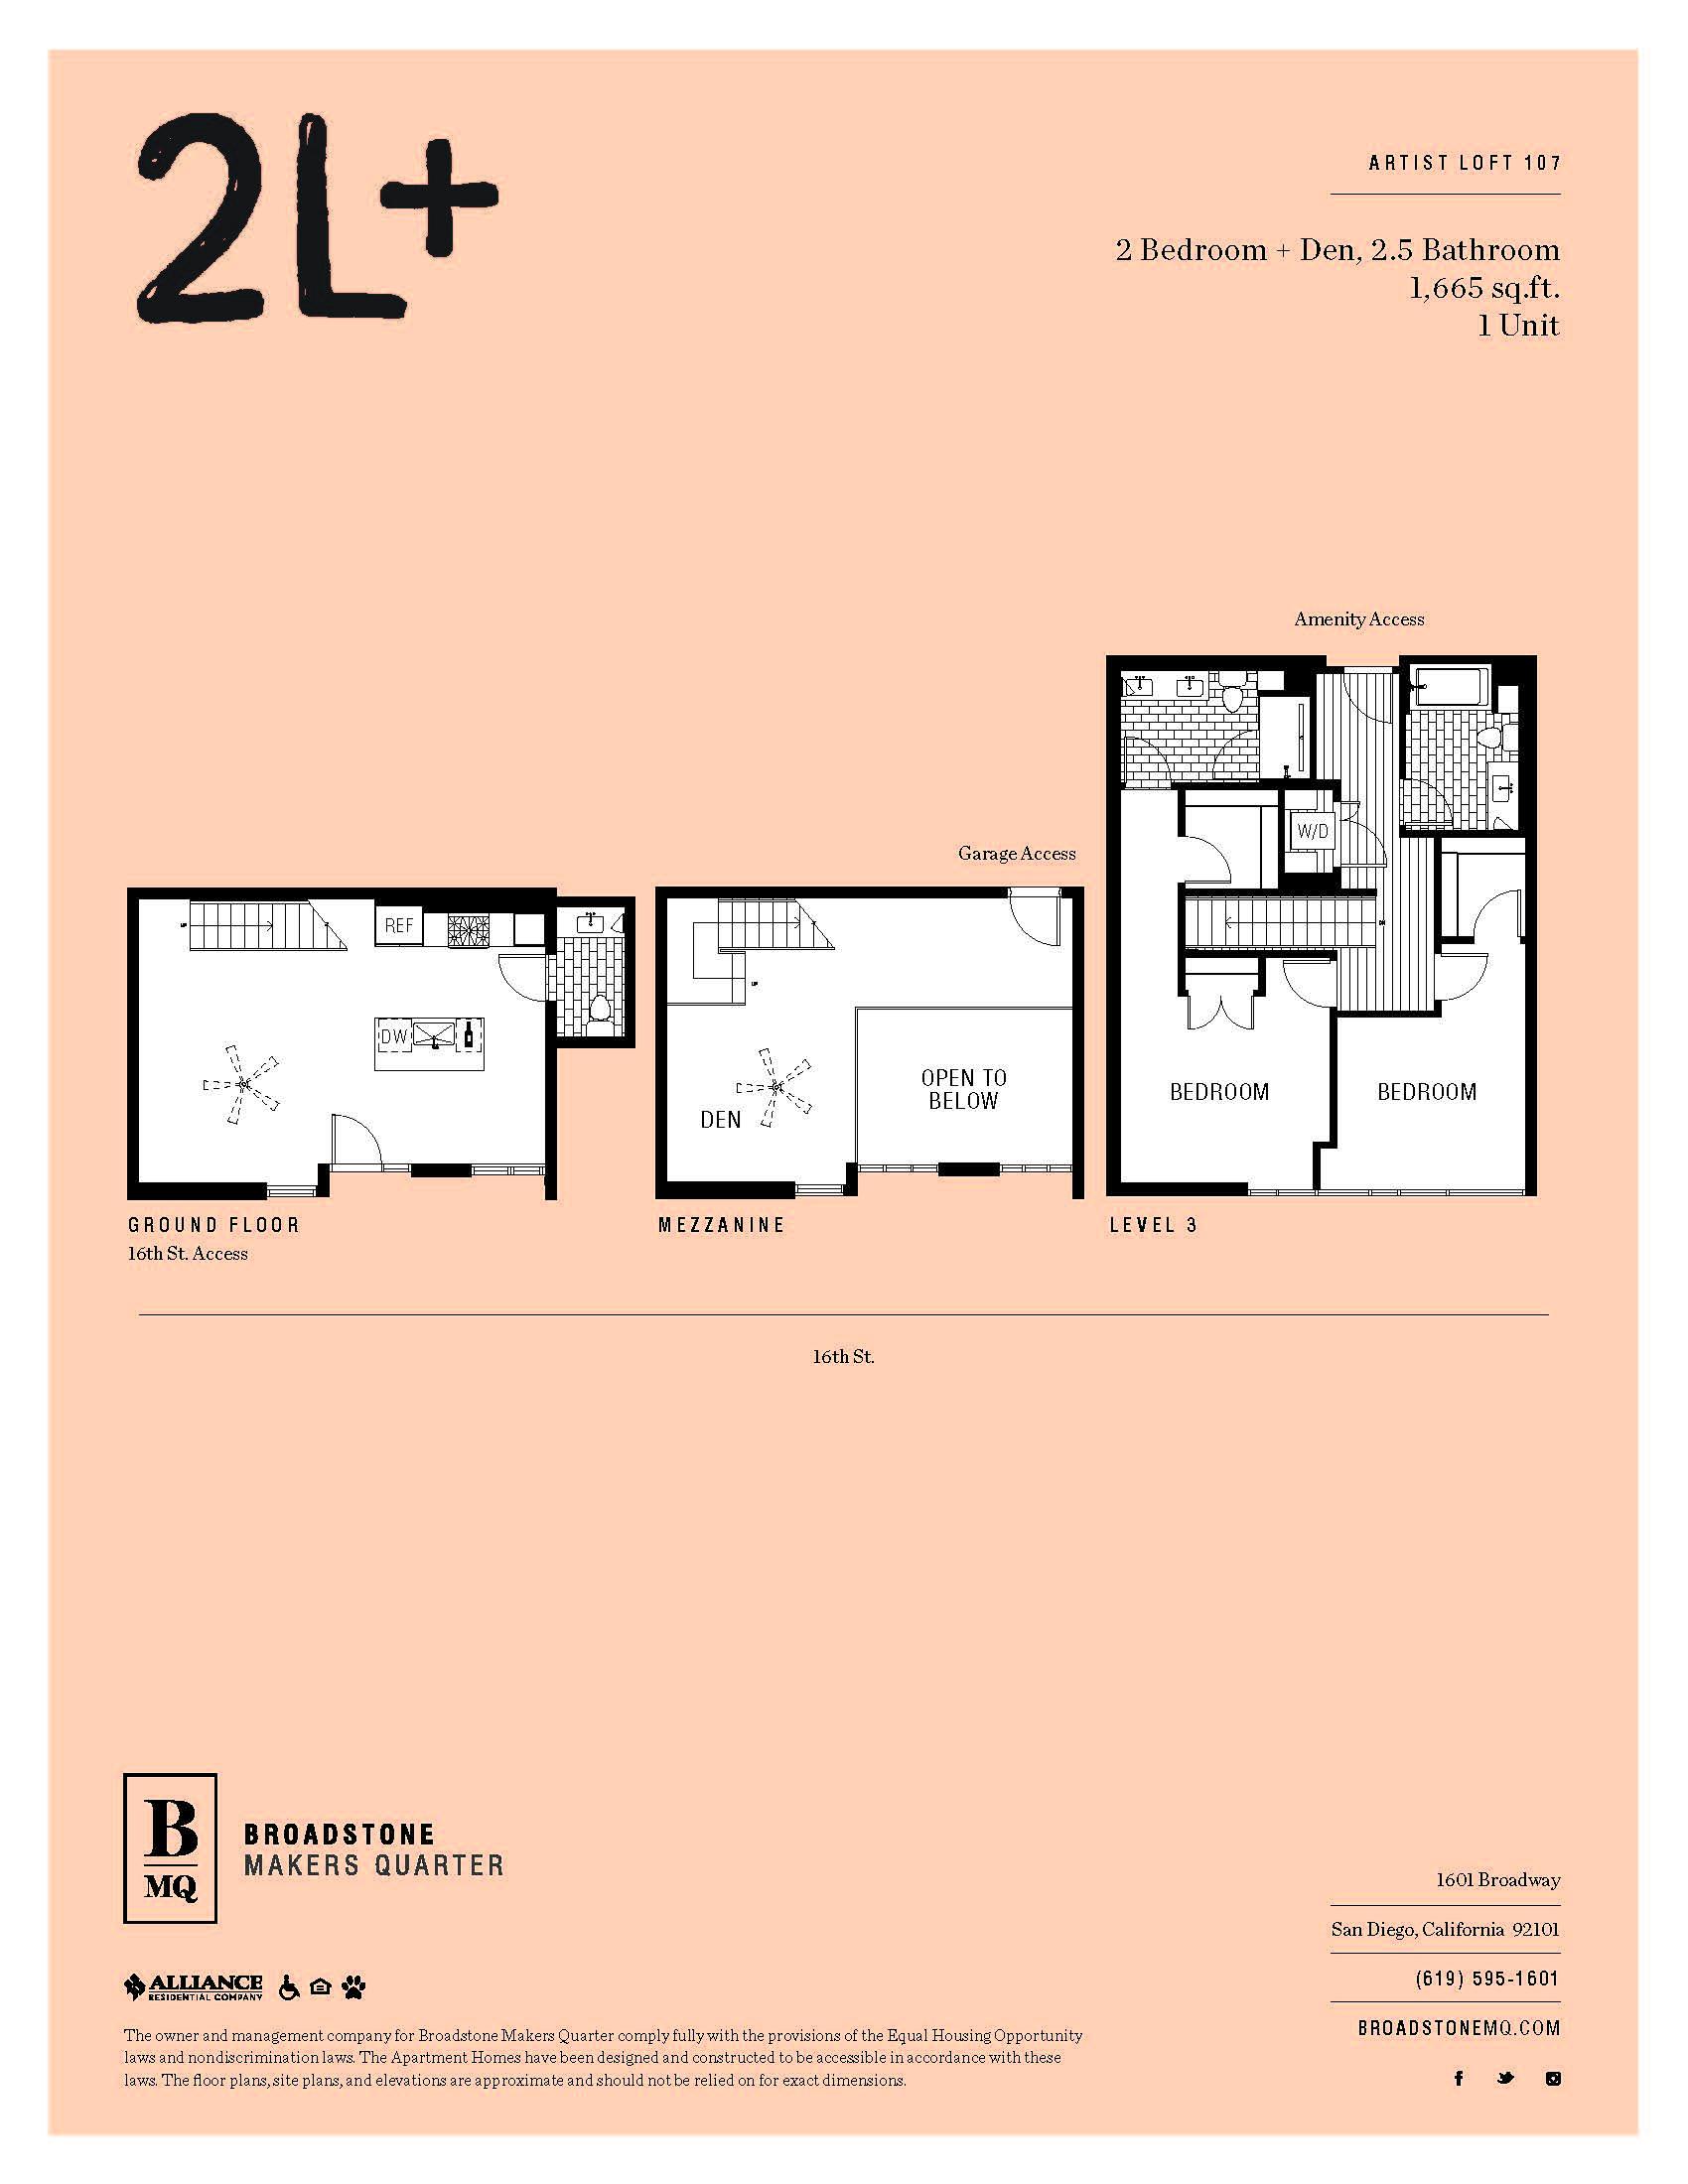 Floor Plans & Availability | BMQ Studio, 1- and 2-Bedrooms